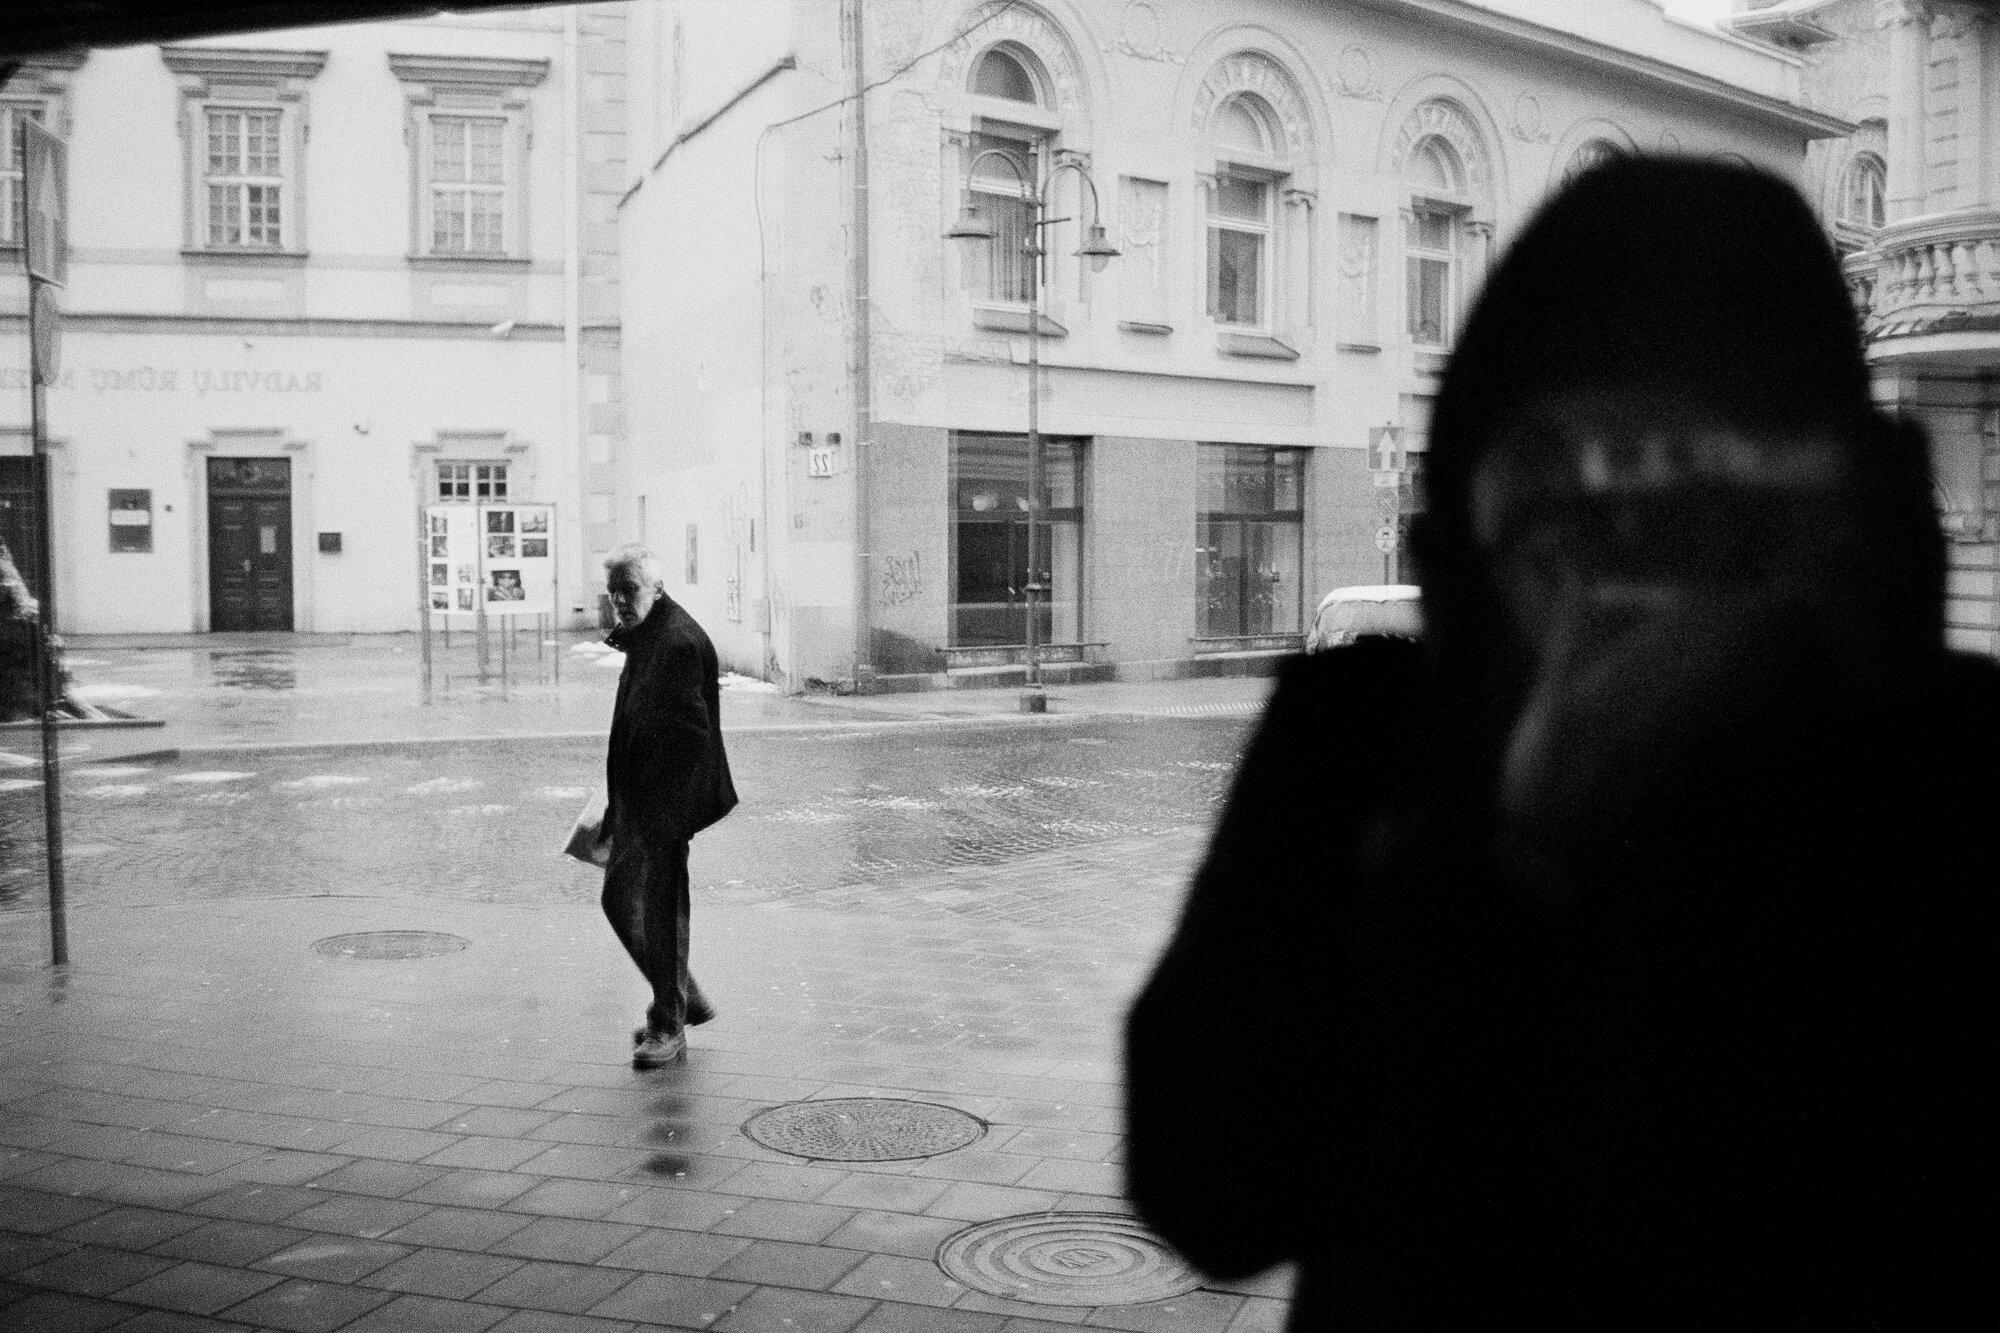 Ignas_Winter-1.jpg